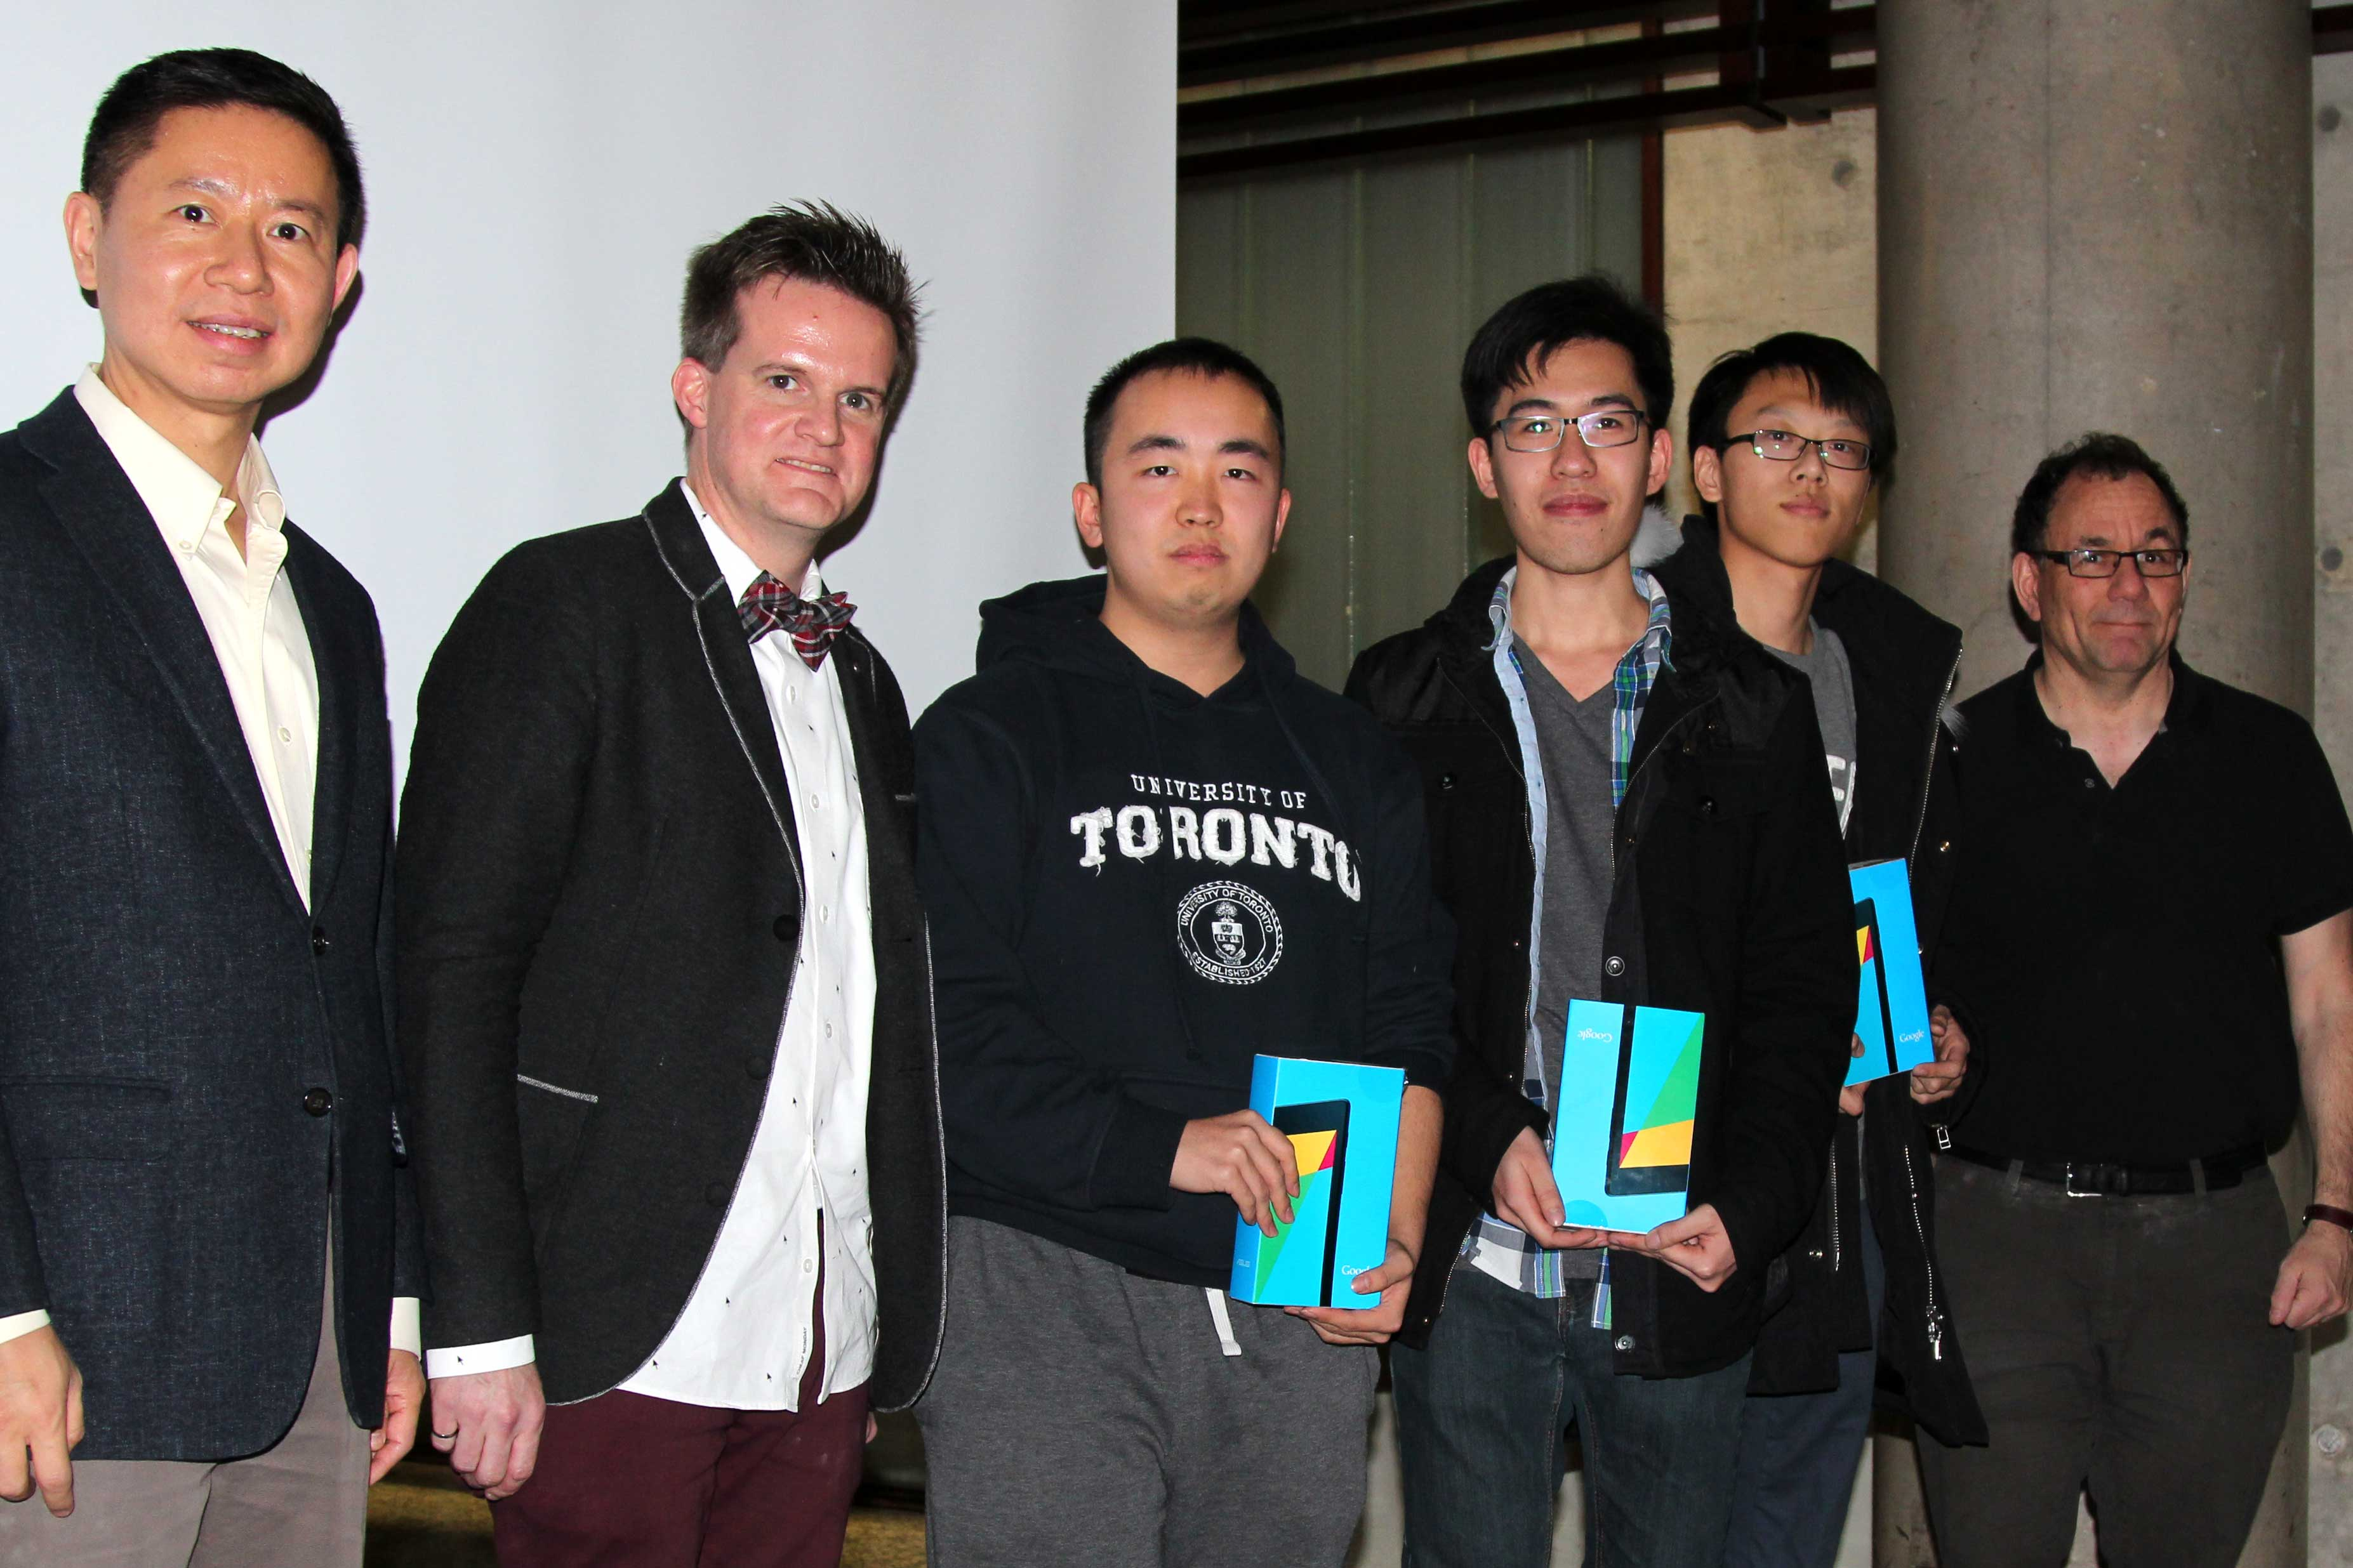 From left: Professor Baochun Li, Professor Jason Anderson, Edward Liu, Ivan Co, Steven Shizhang Yin, and Professor Jonathan Rose.